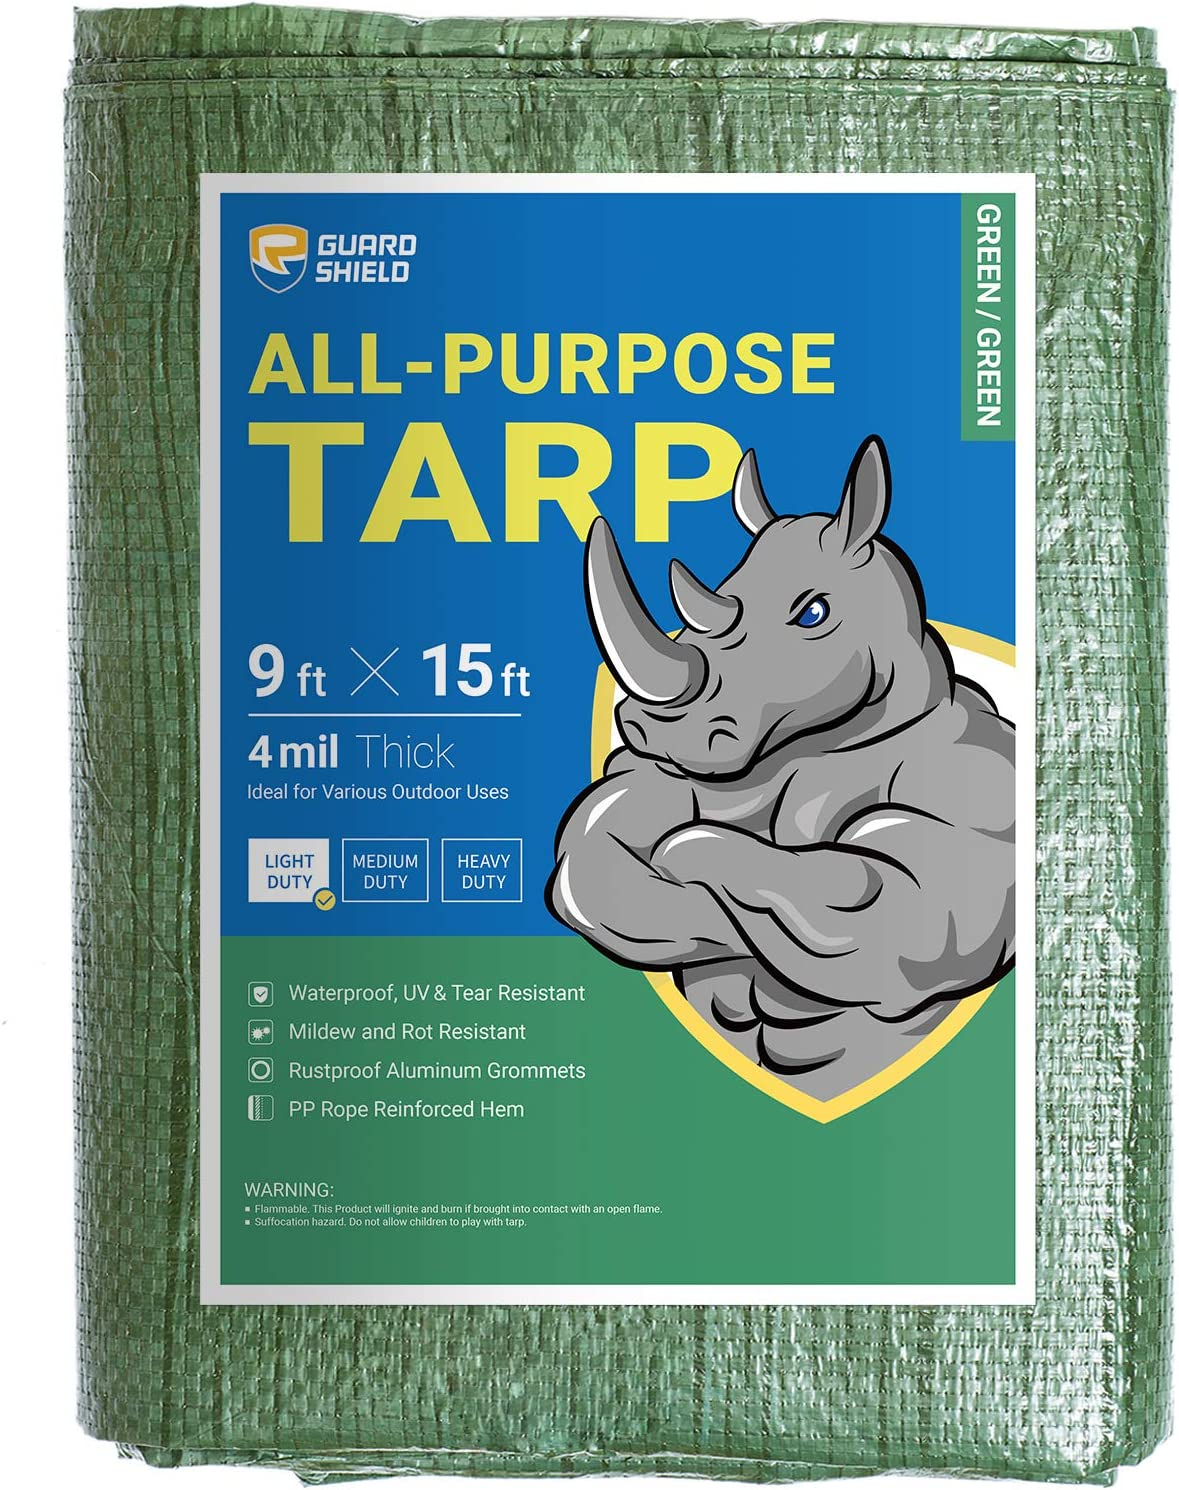 GUARD SHIELD Tarp 9x15 Feet Poly Los Angeles Mall Green Multi Waterproof Popular product Purpose